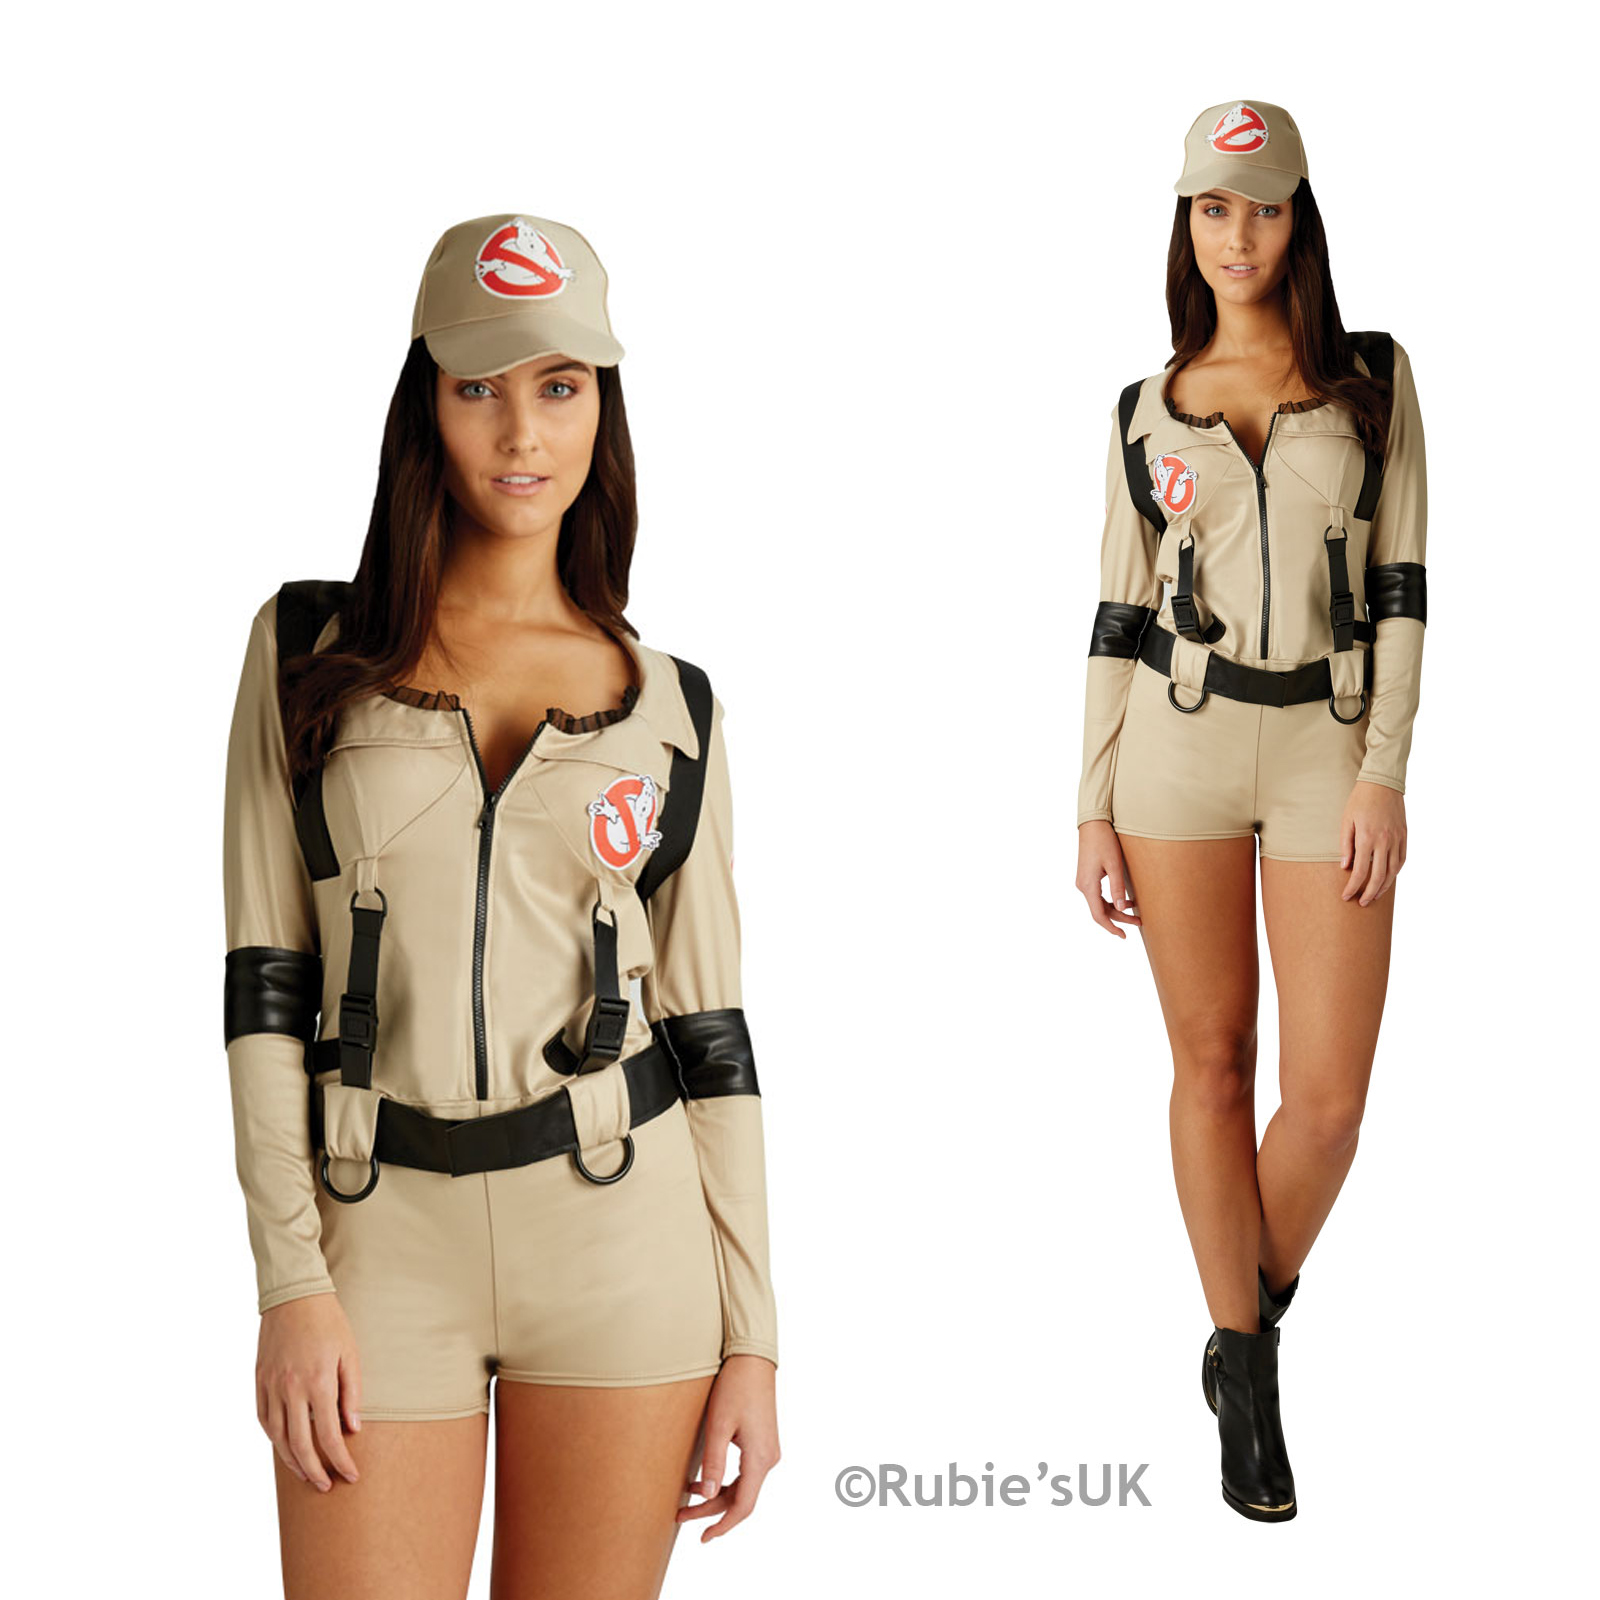 rubies damen ghostbusters shorts damen sexy kost m kleid outfit ebay. Black Bedroom Furniture Sets. Home Design Ideas